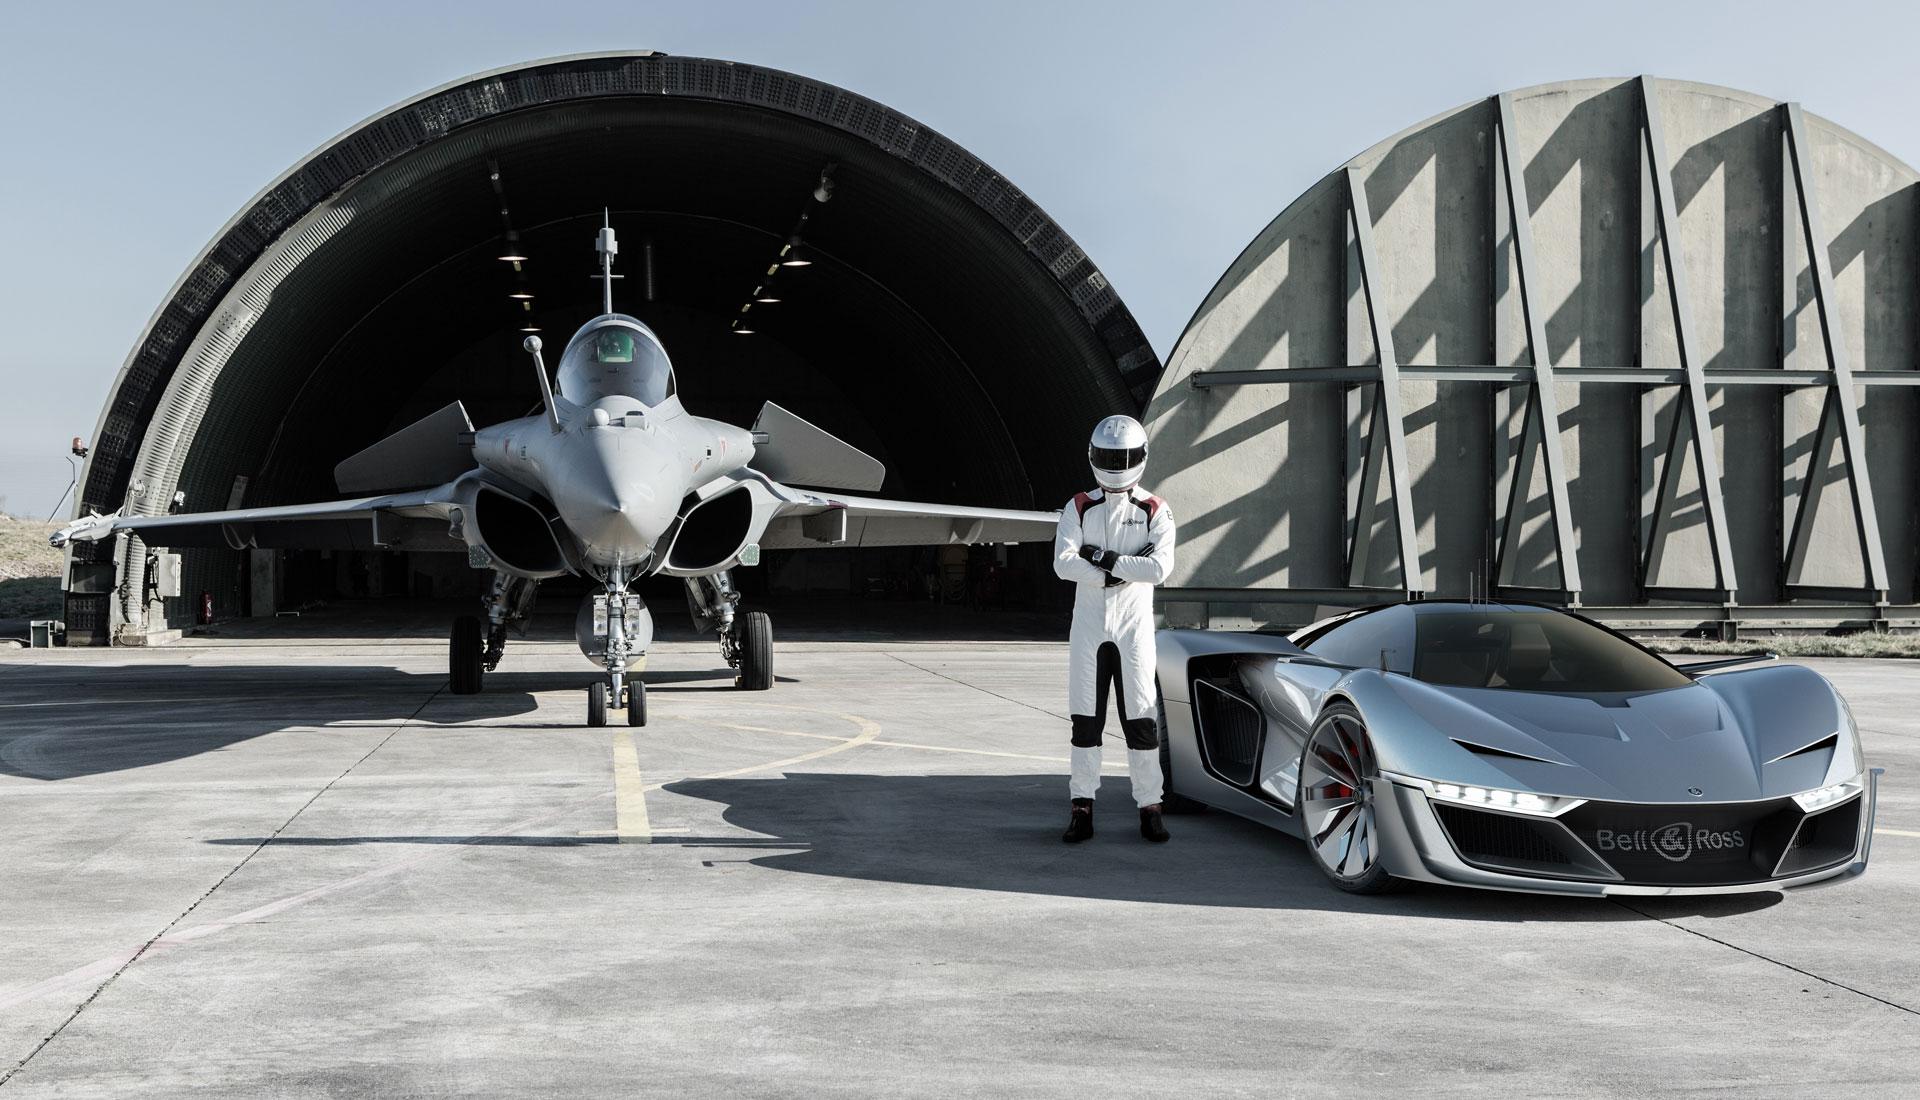 Bell&Ross Aero GT